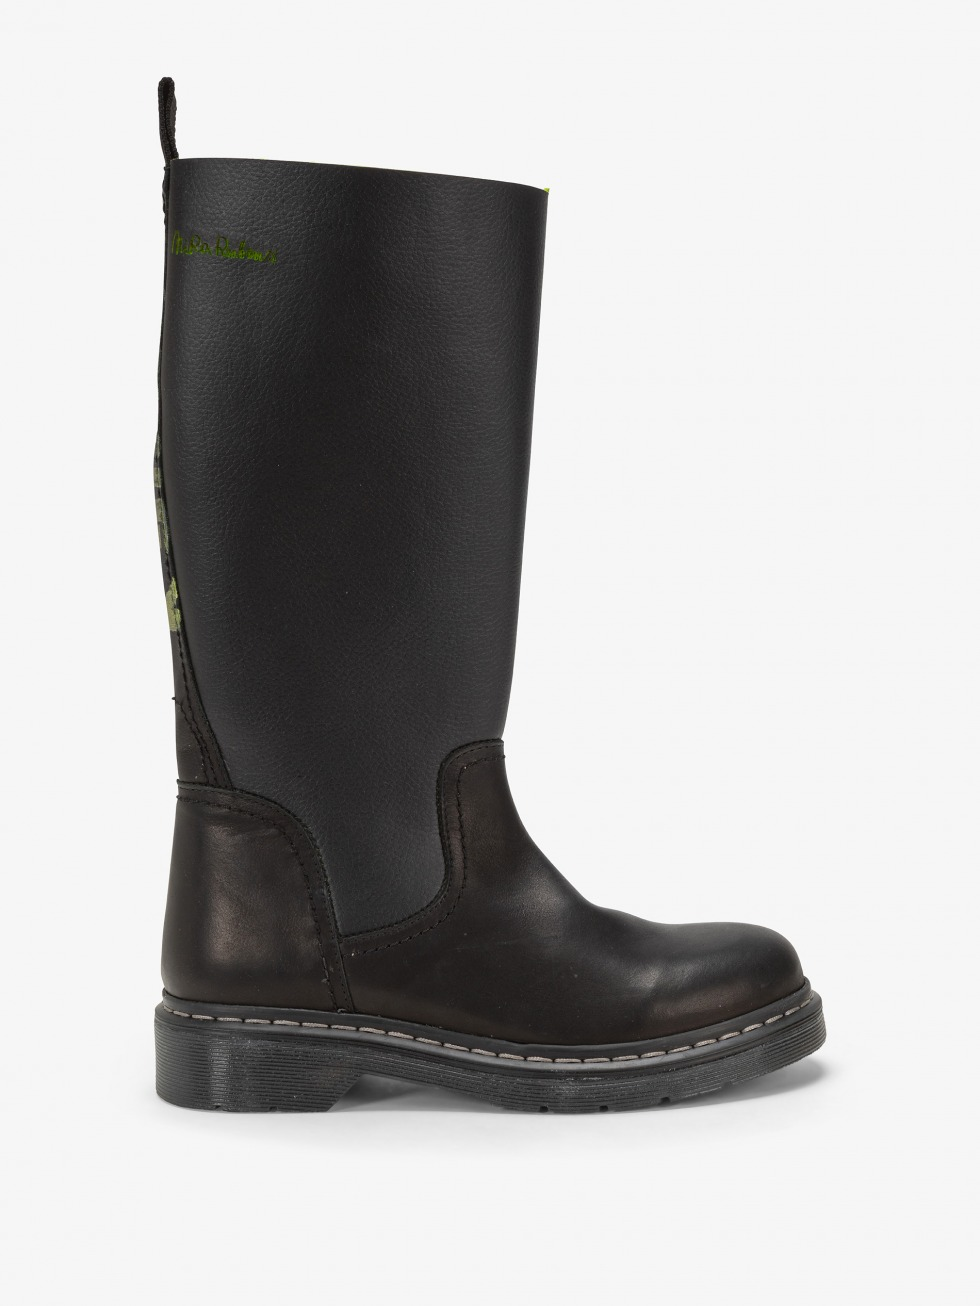 Frozen Boot - Rebel Black Lime